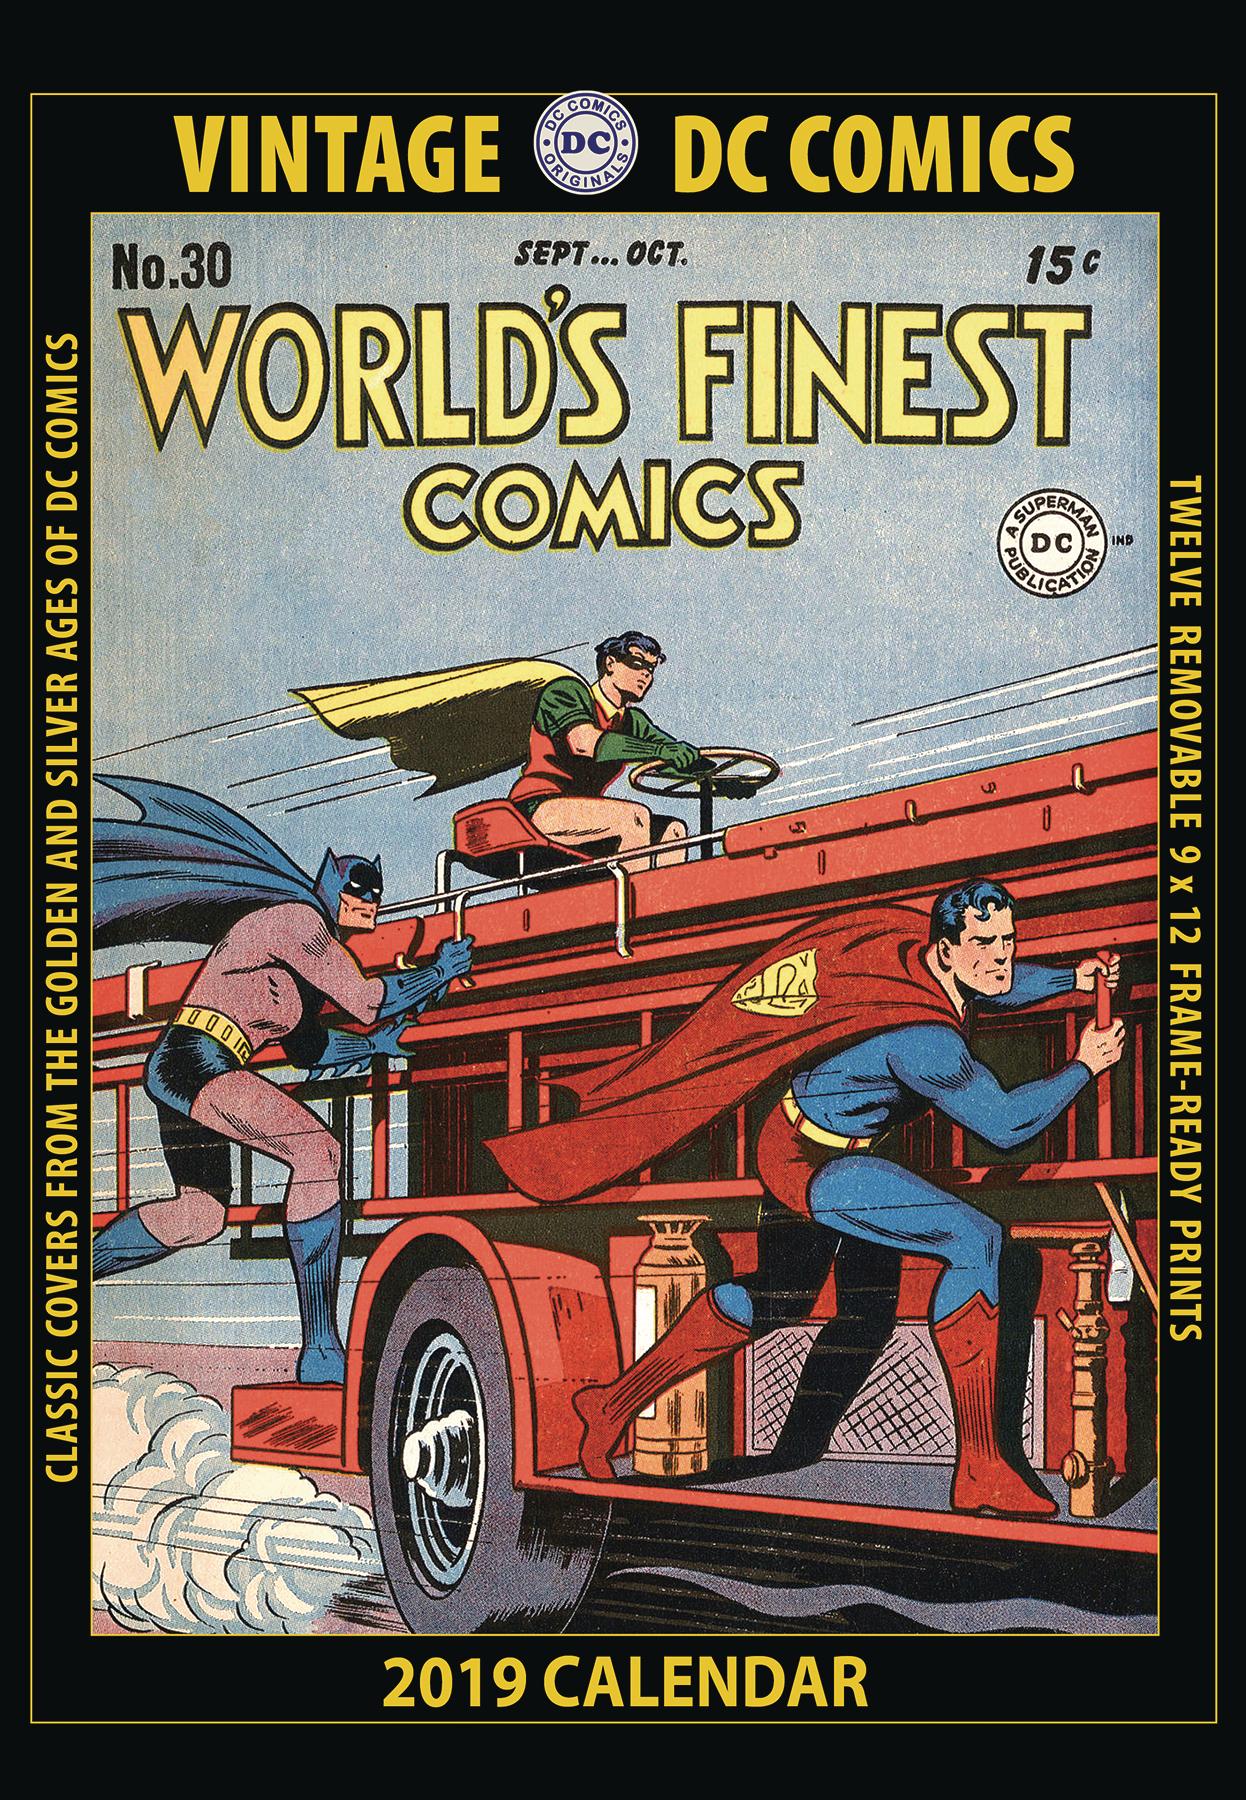 Gradually. Dc comics classic covers